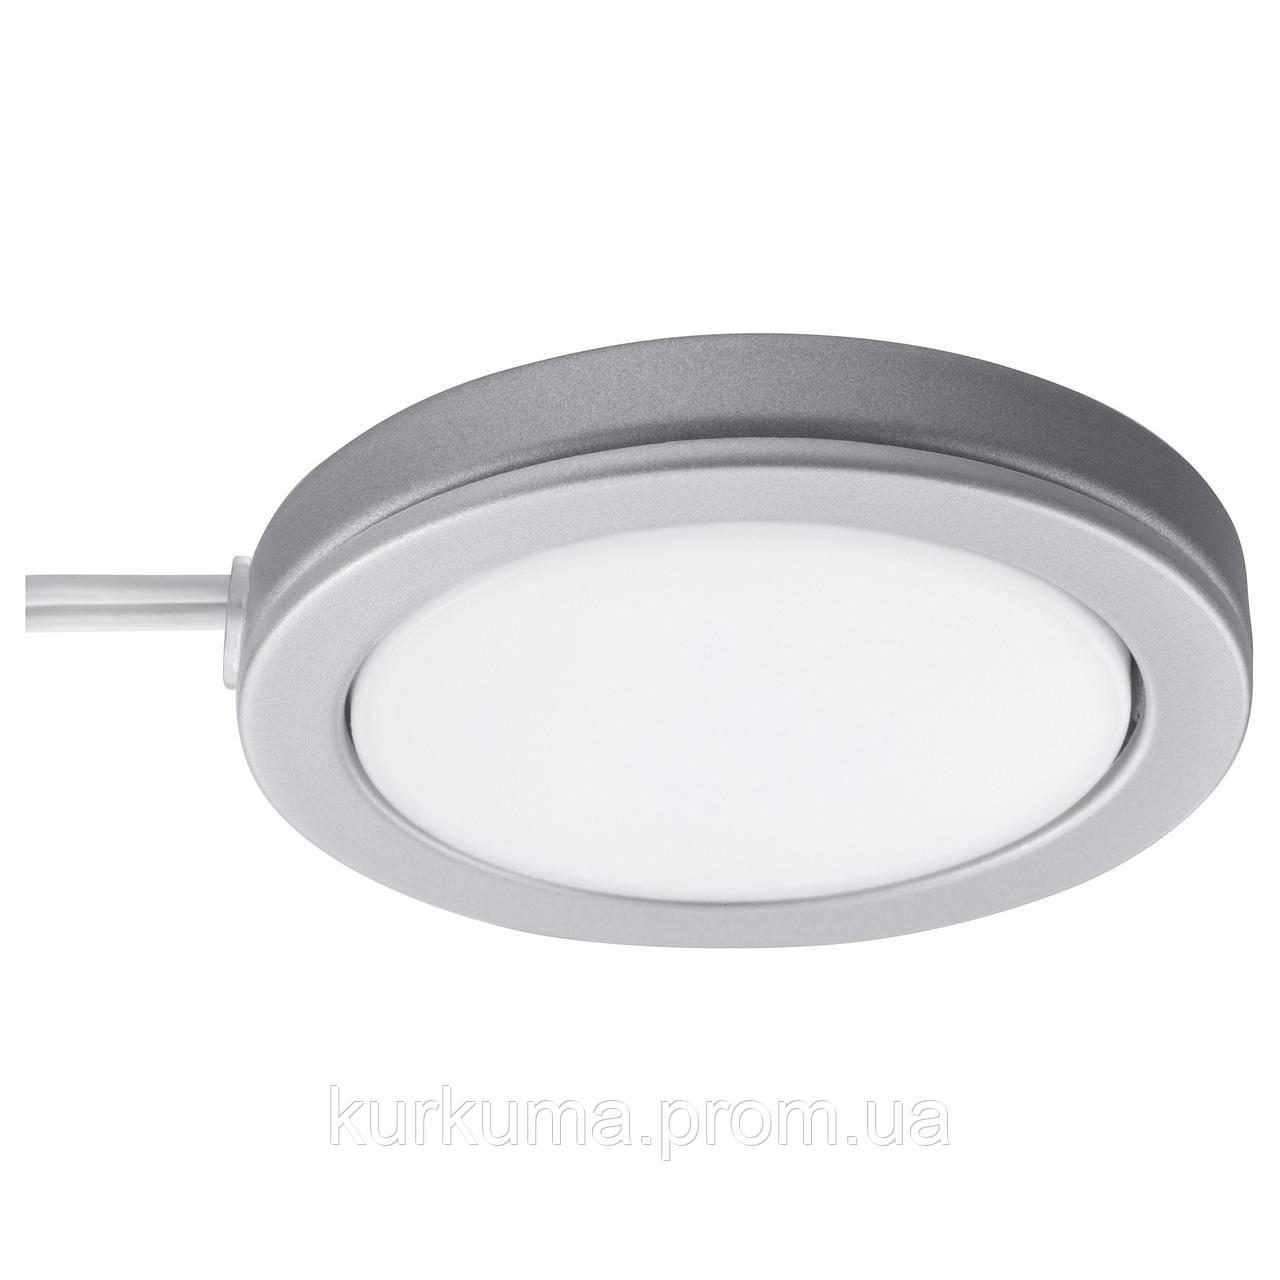 IKEA OMLOPP Светодиодная подсветка, серебро  (502.329.60)